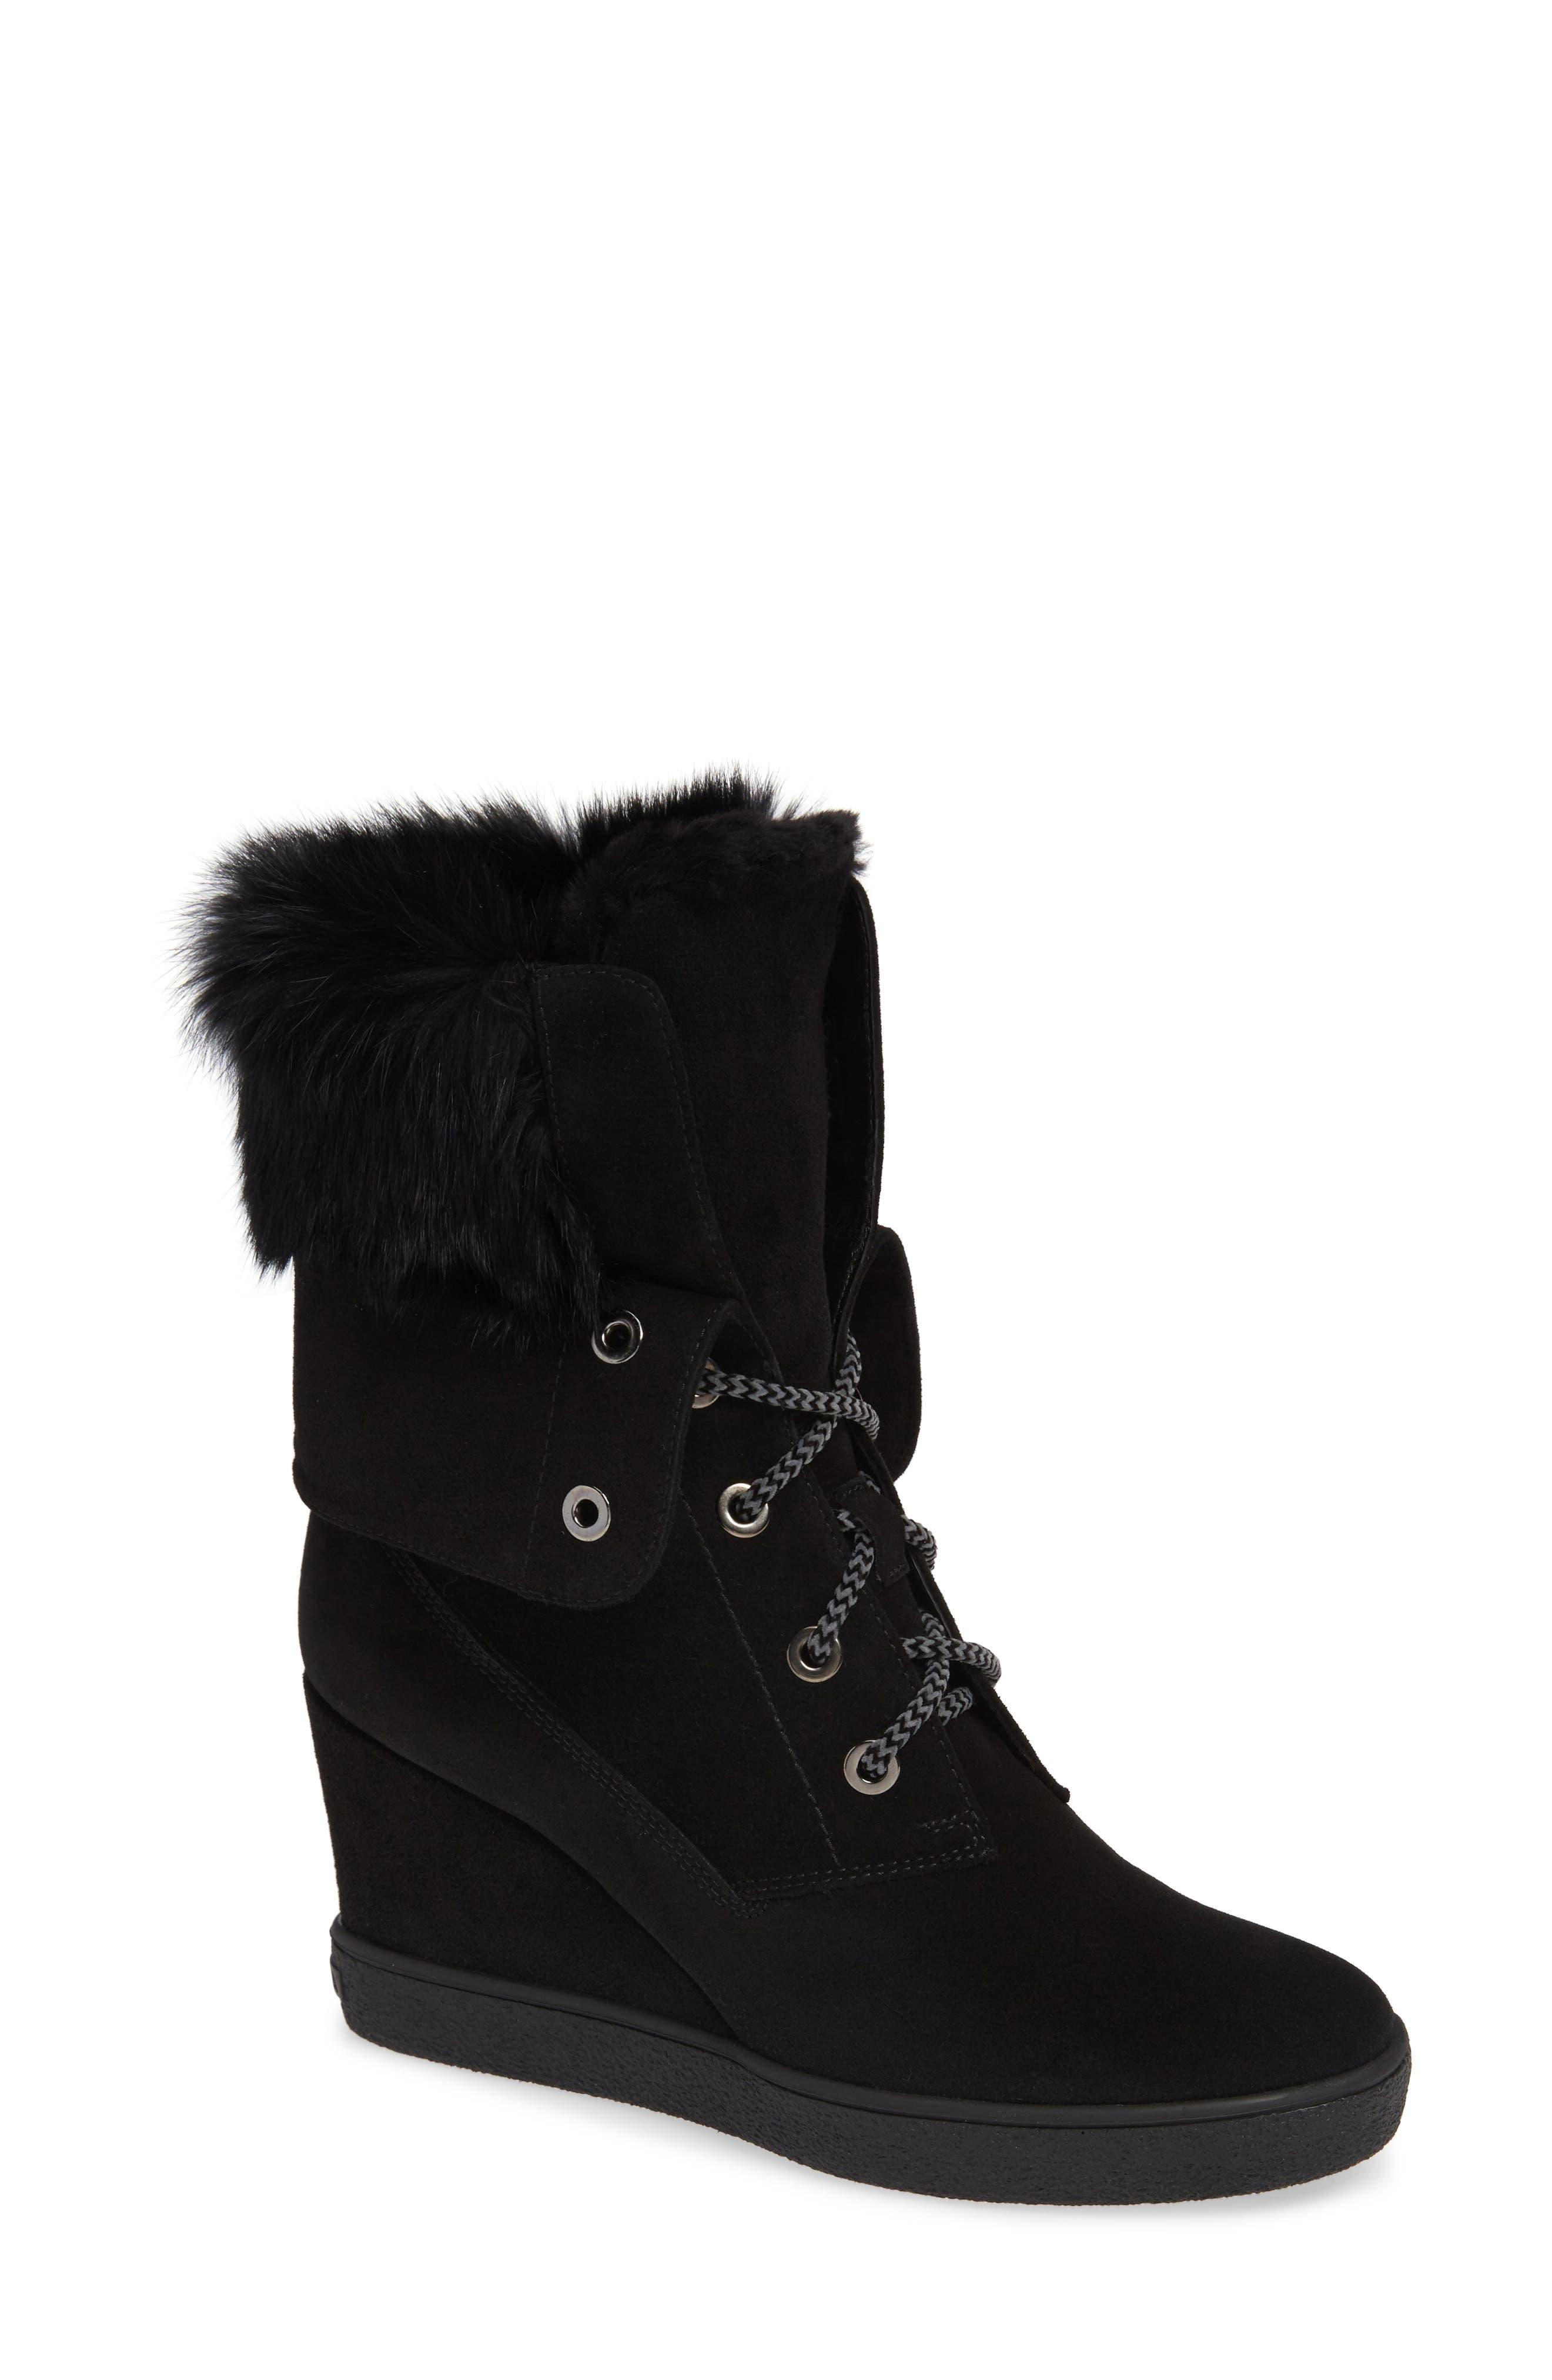 Aquatalia Cordelia Water Resistant Genuine Rabbit Fur Boot, Black